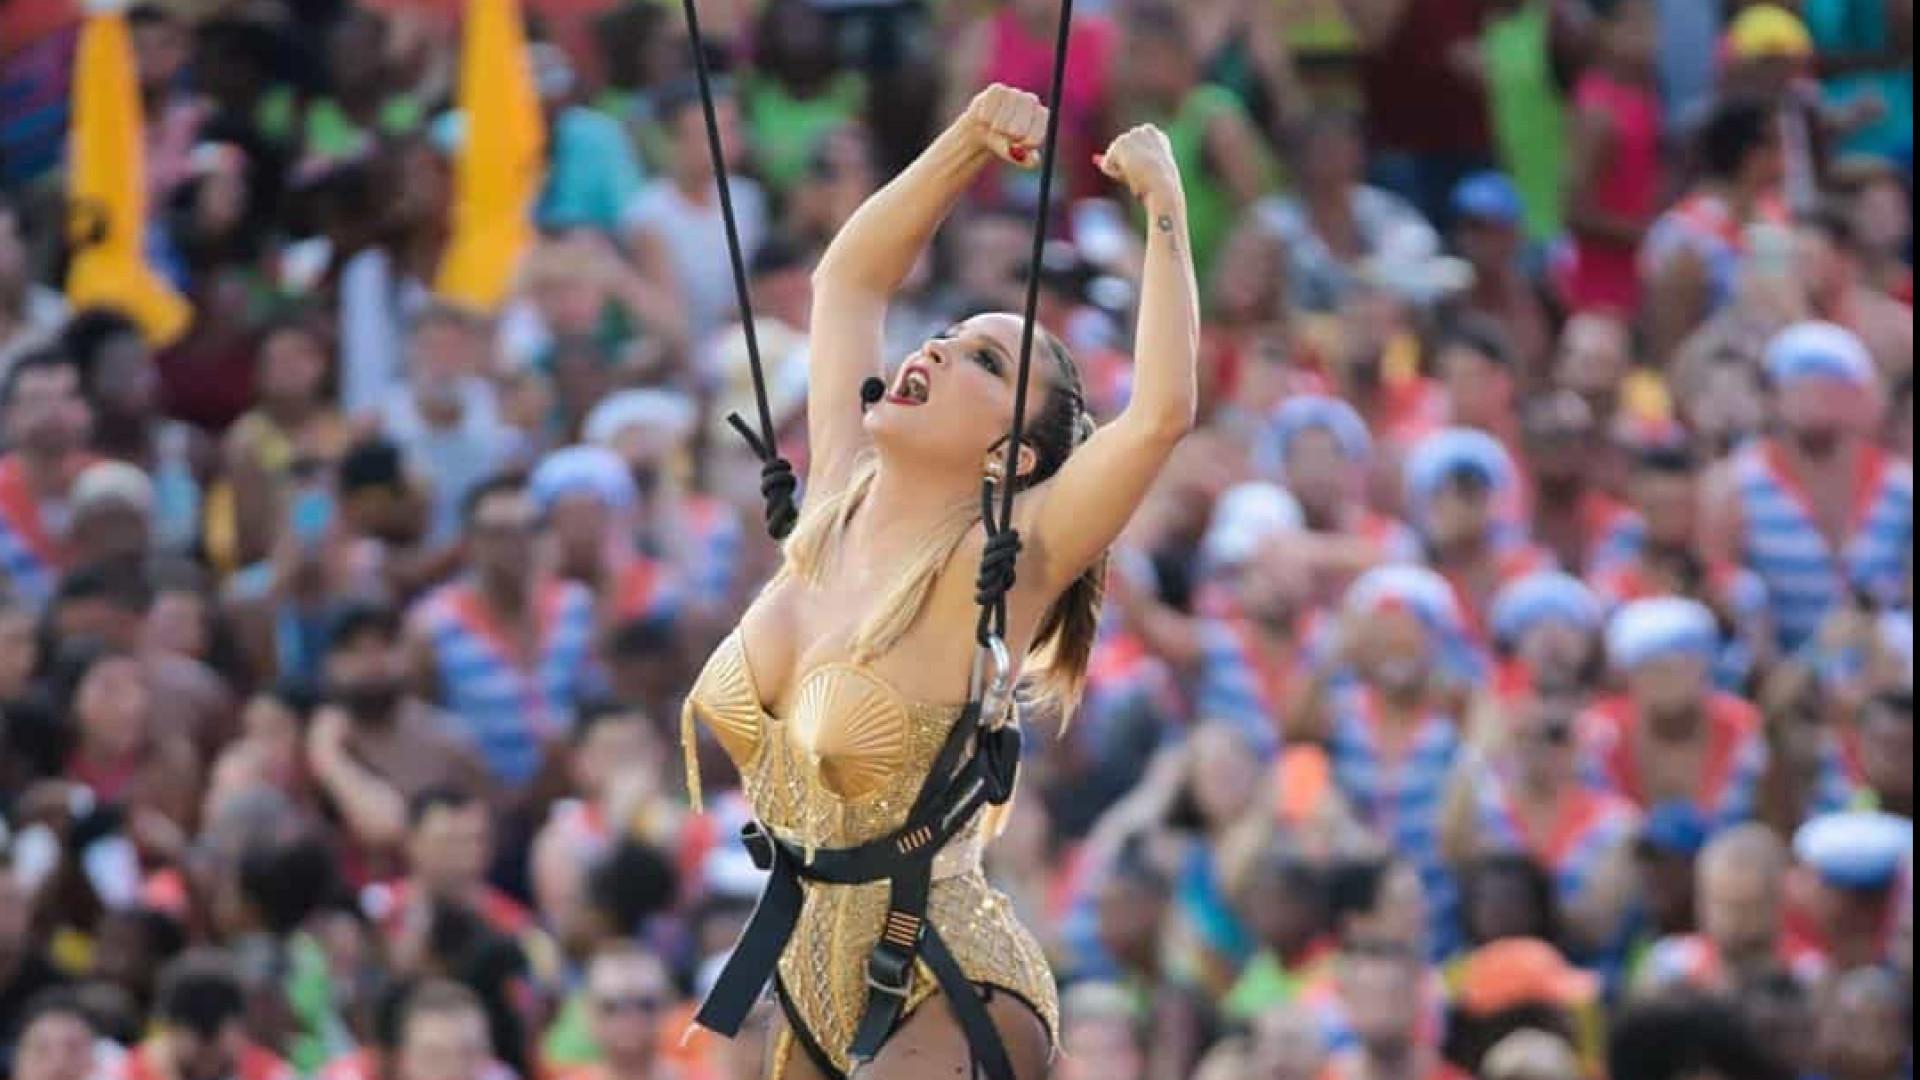 Vestida de Madonna, Claudia Leitte chega 'voando' ao Carnaval